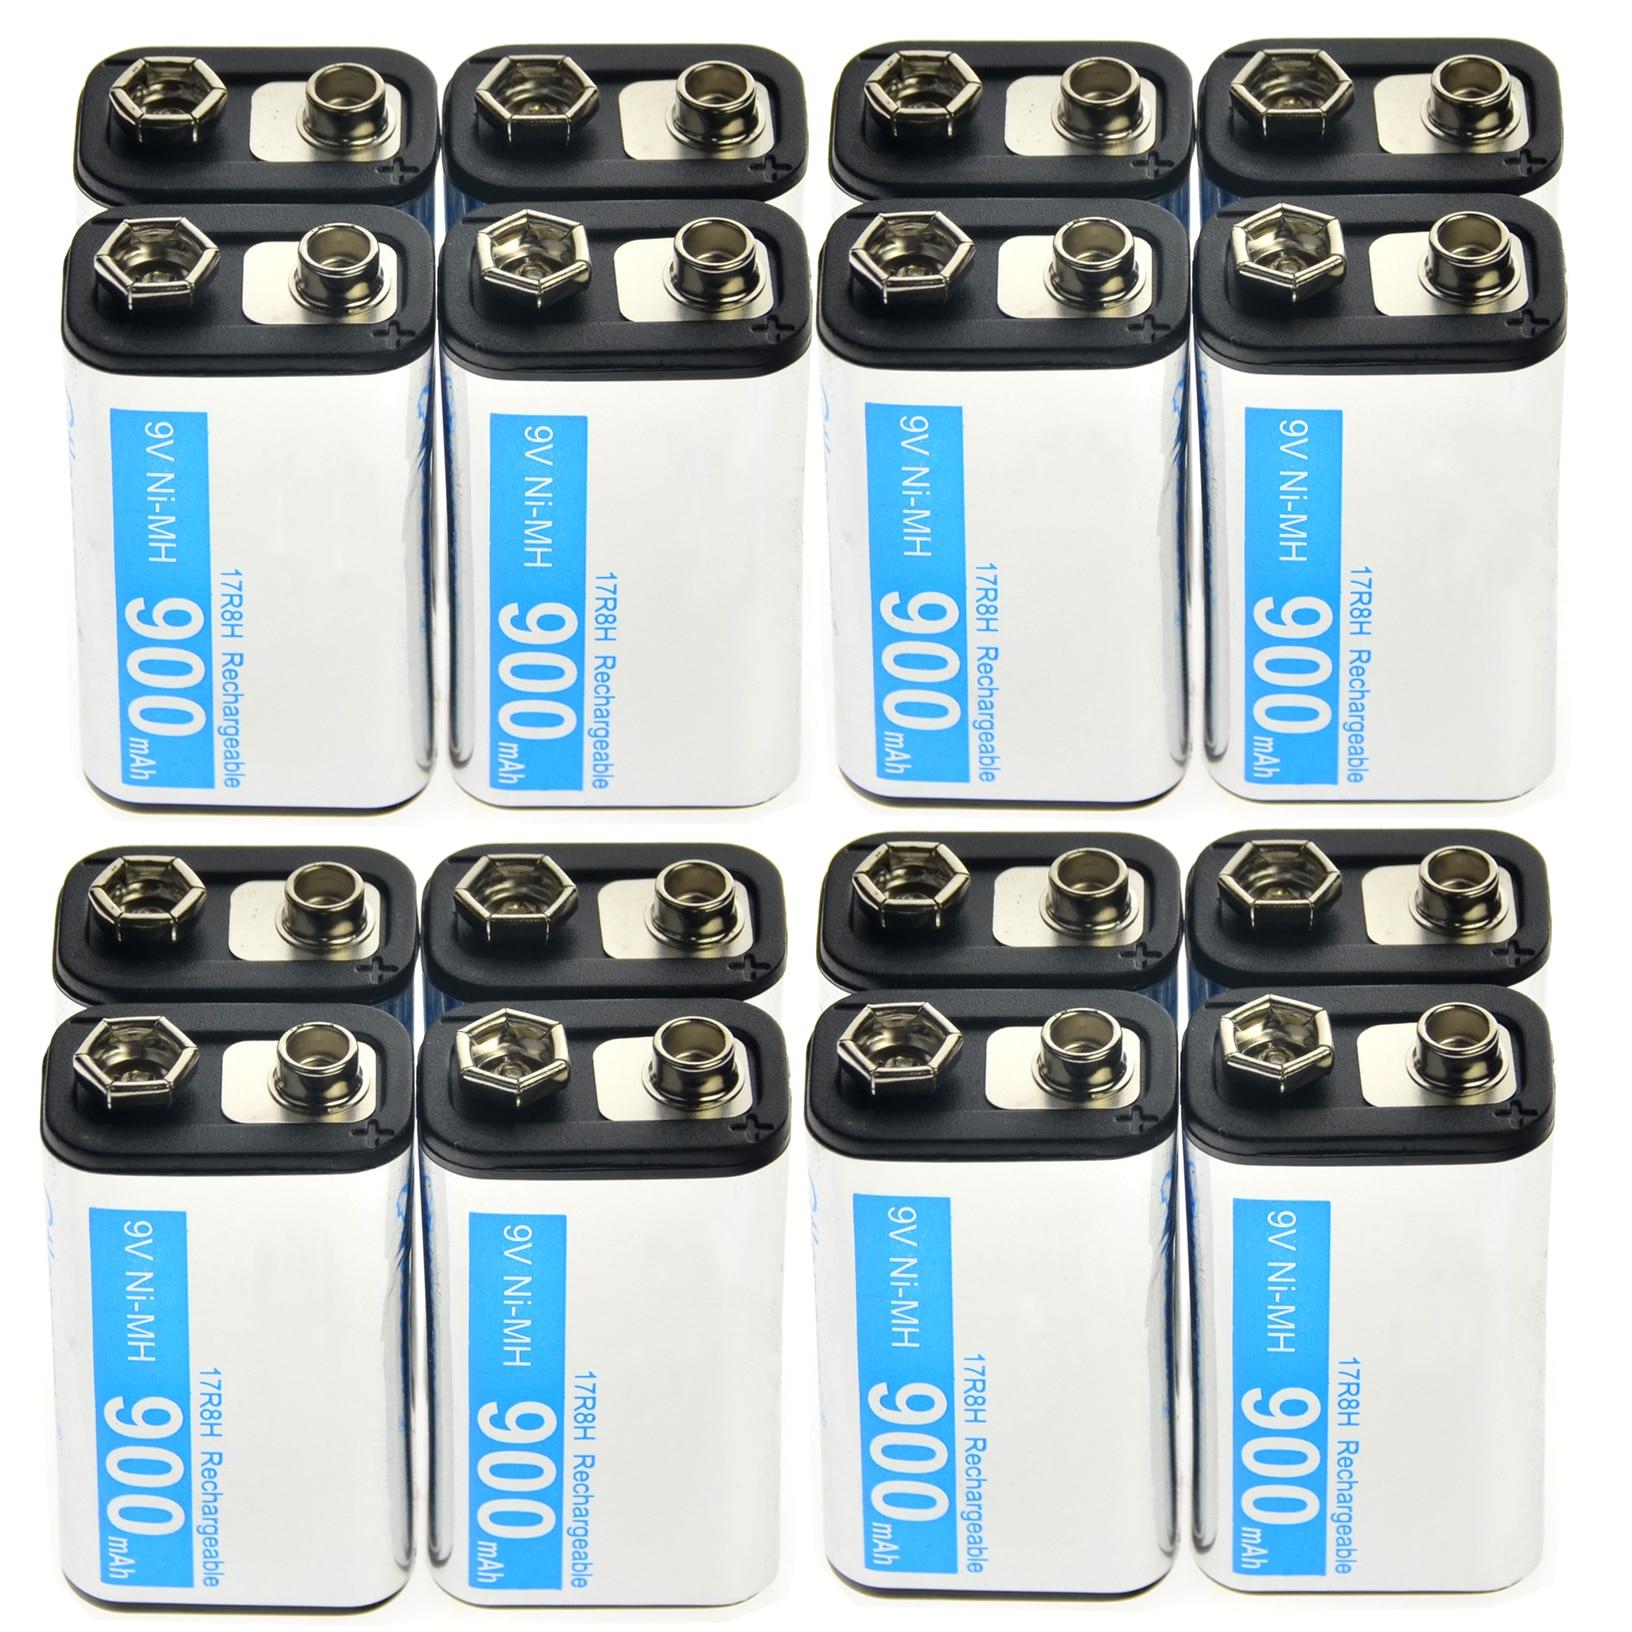 2-24 stücke 9 V 900 mAh akku Zelle Durable Batterie PPS Schwarz NiMh block Power